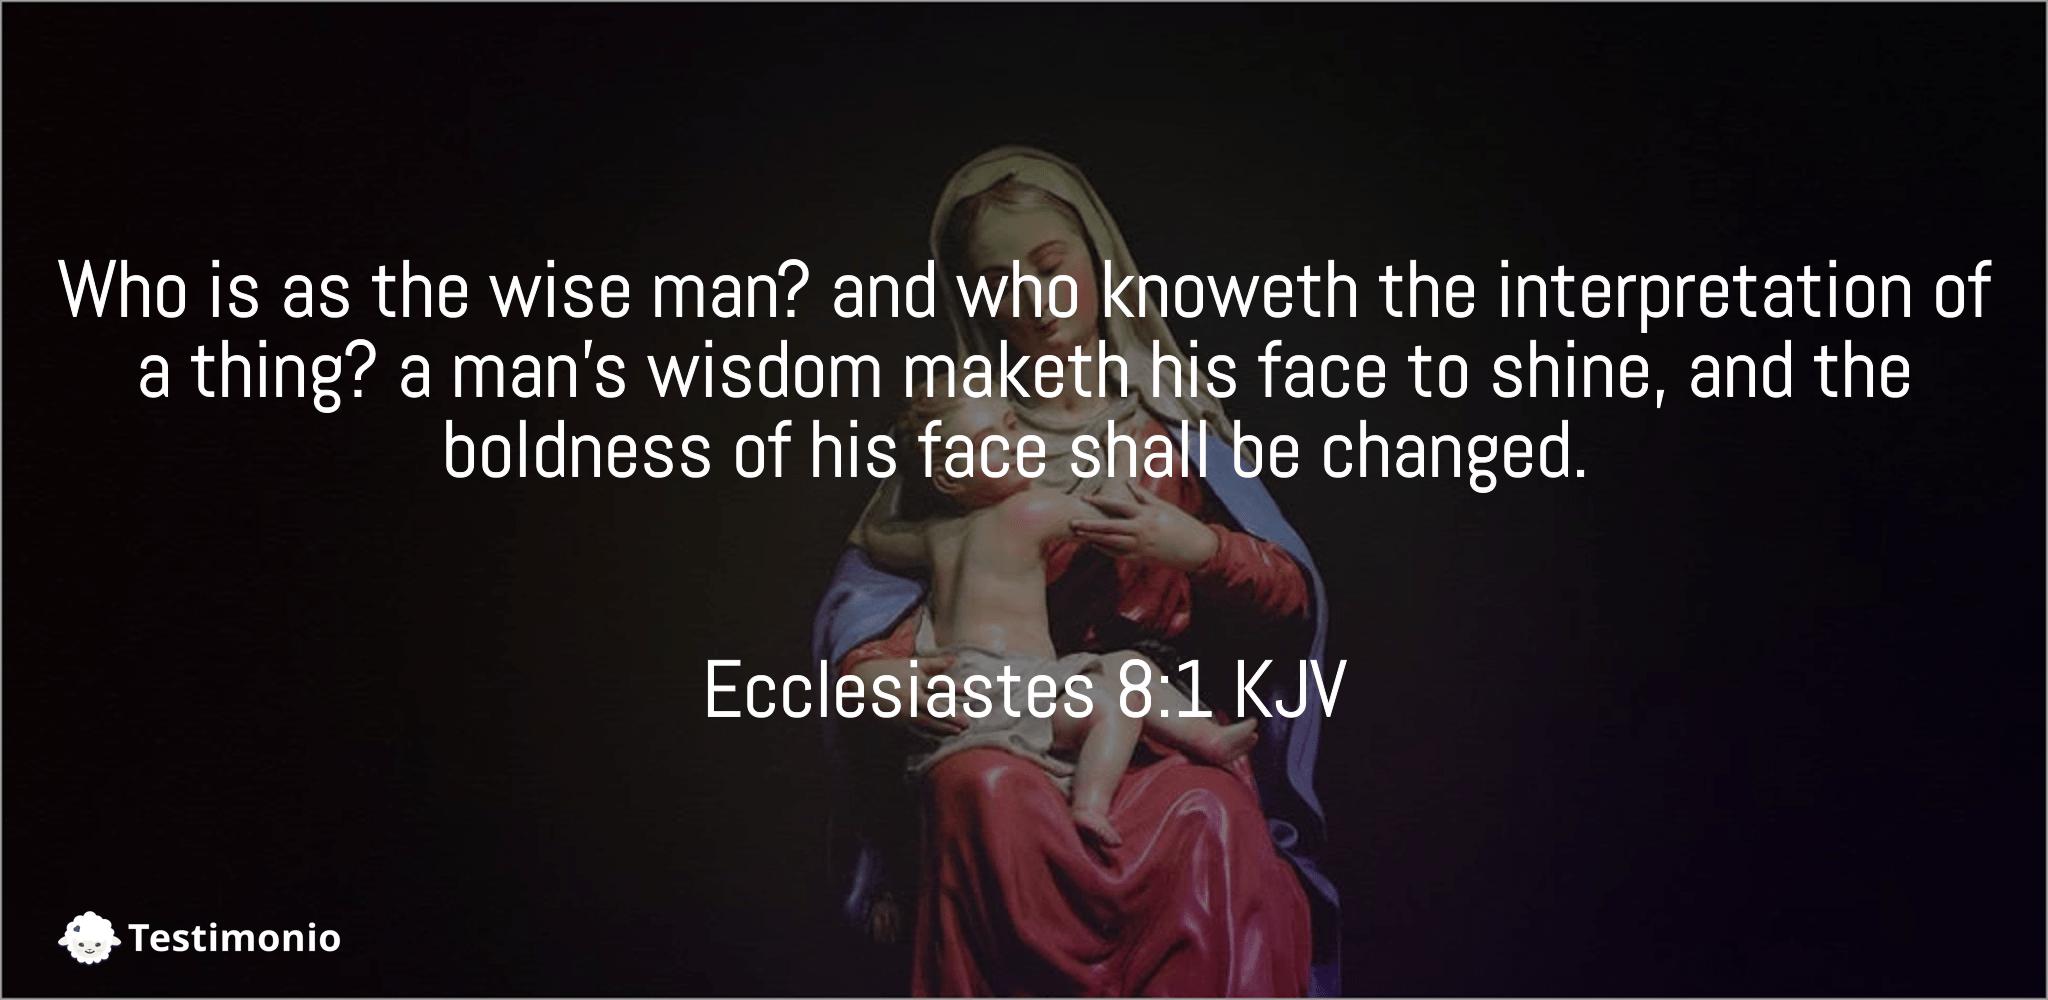 Ecclesiastes 8:1